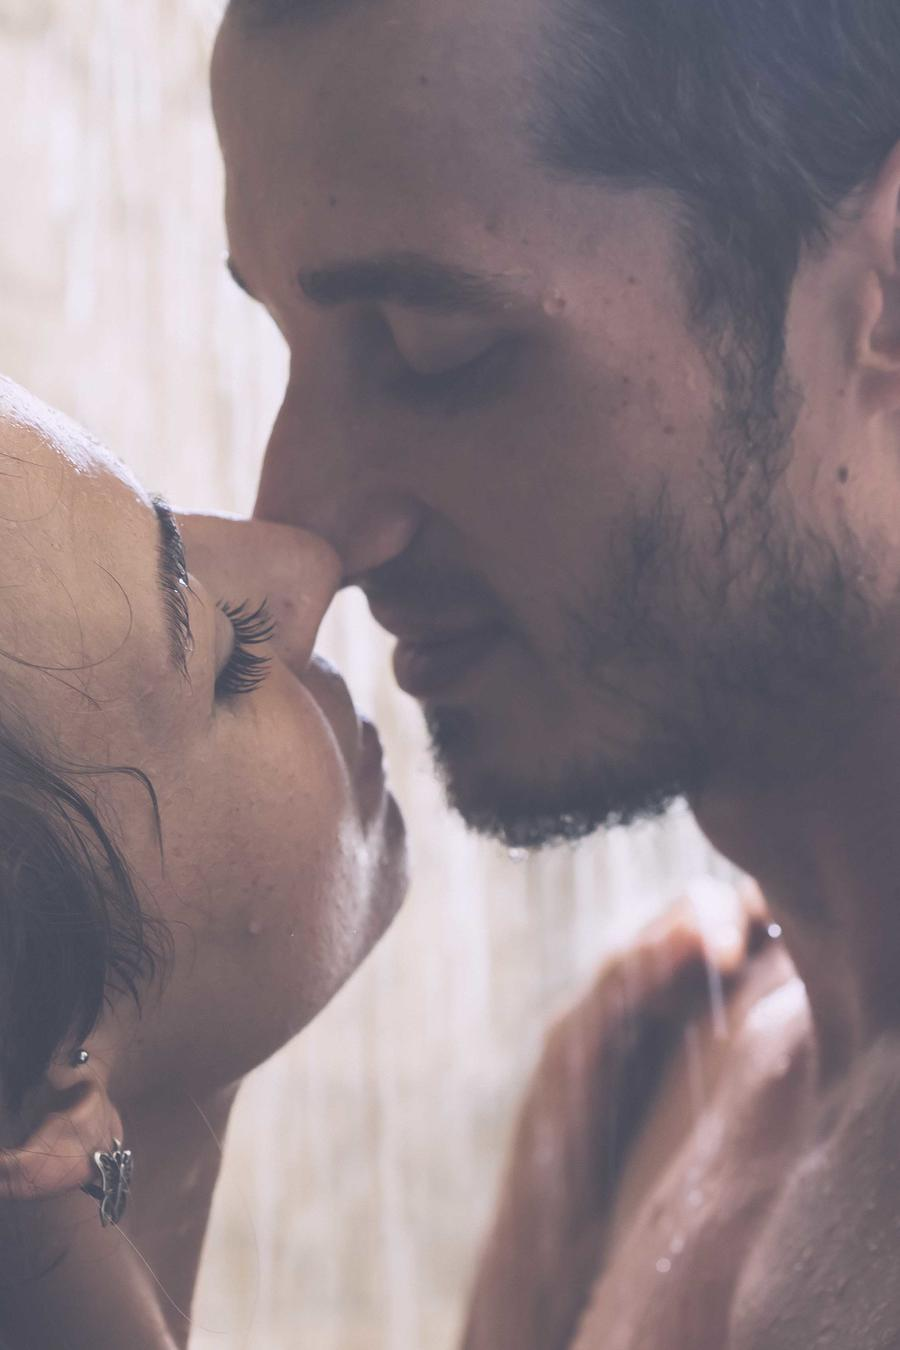 Pareja besándose bajo la ducha